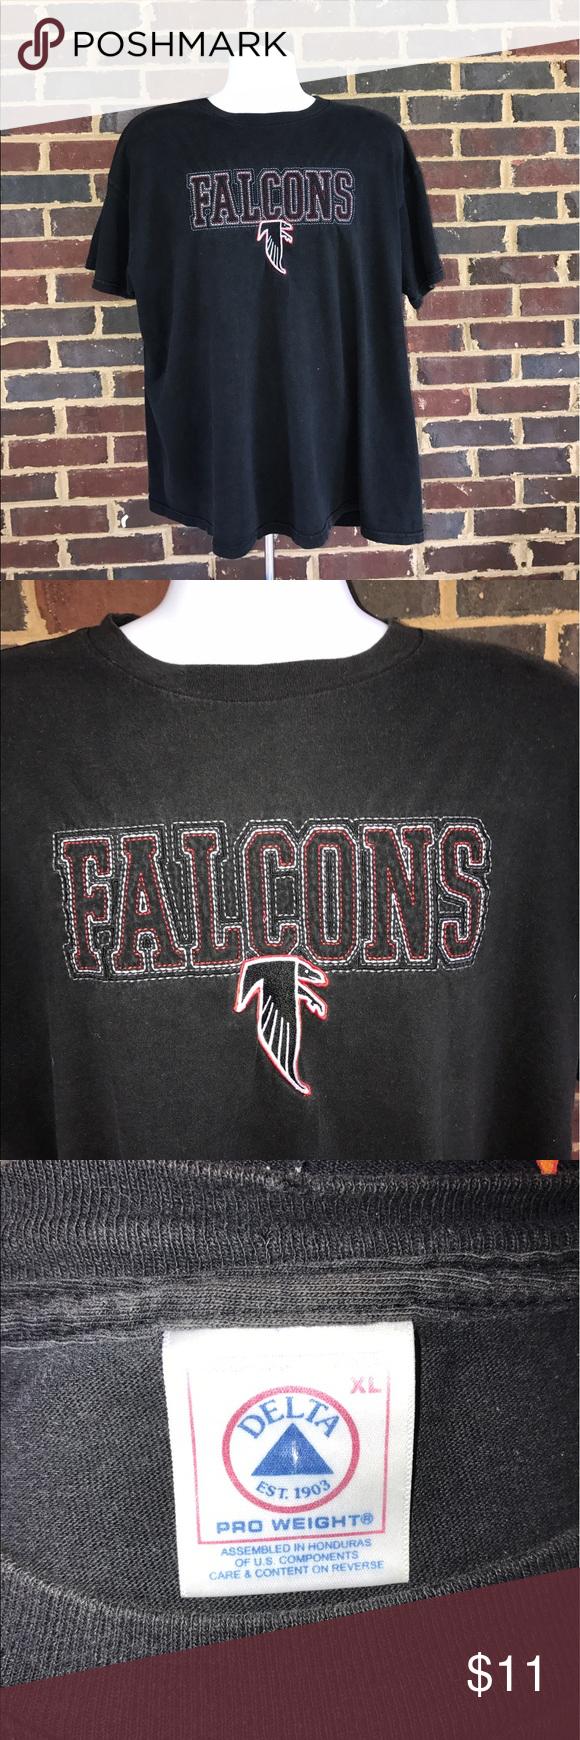 Atlanta Falcons Embroidered NFL shirt